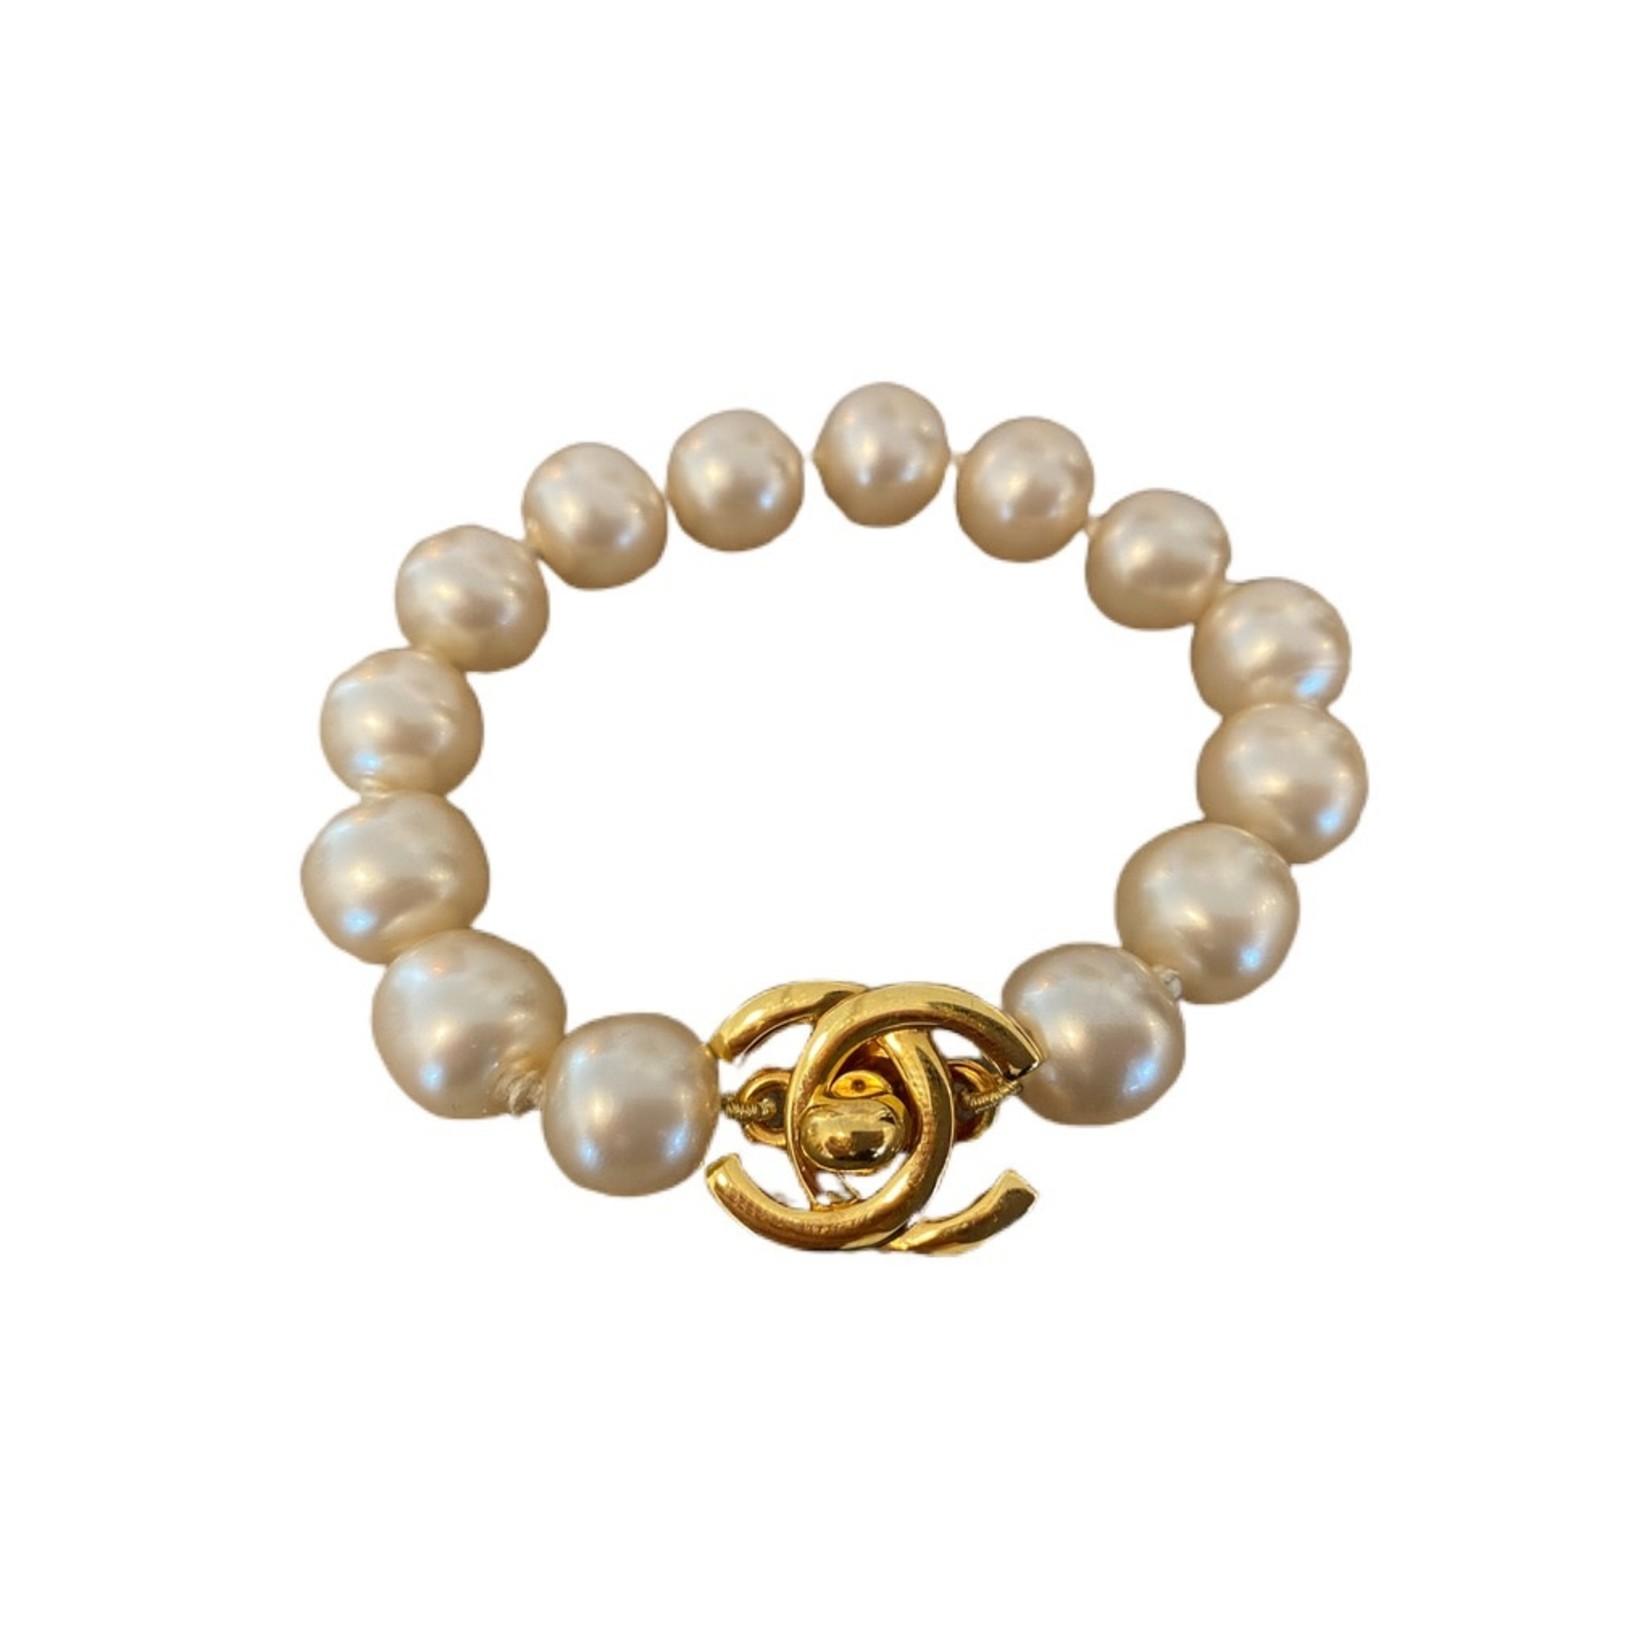 Wyld Blue Vintage Chanel Turnlock Pearl Bracelet